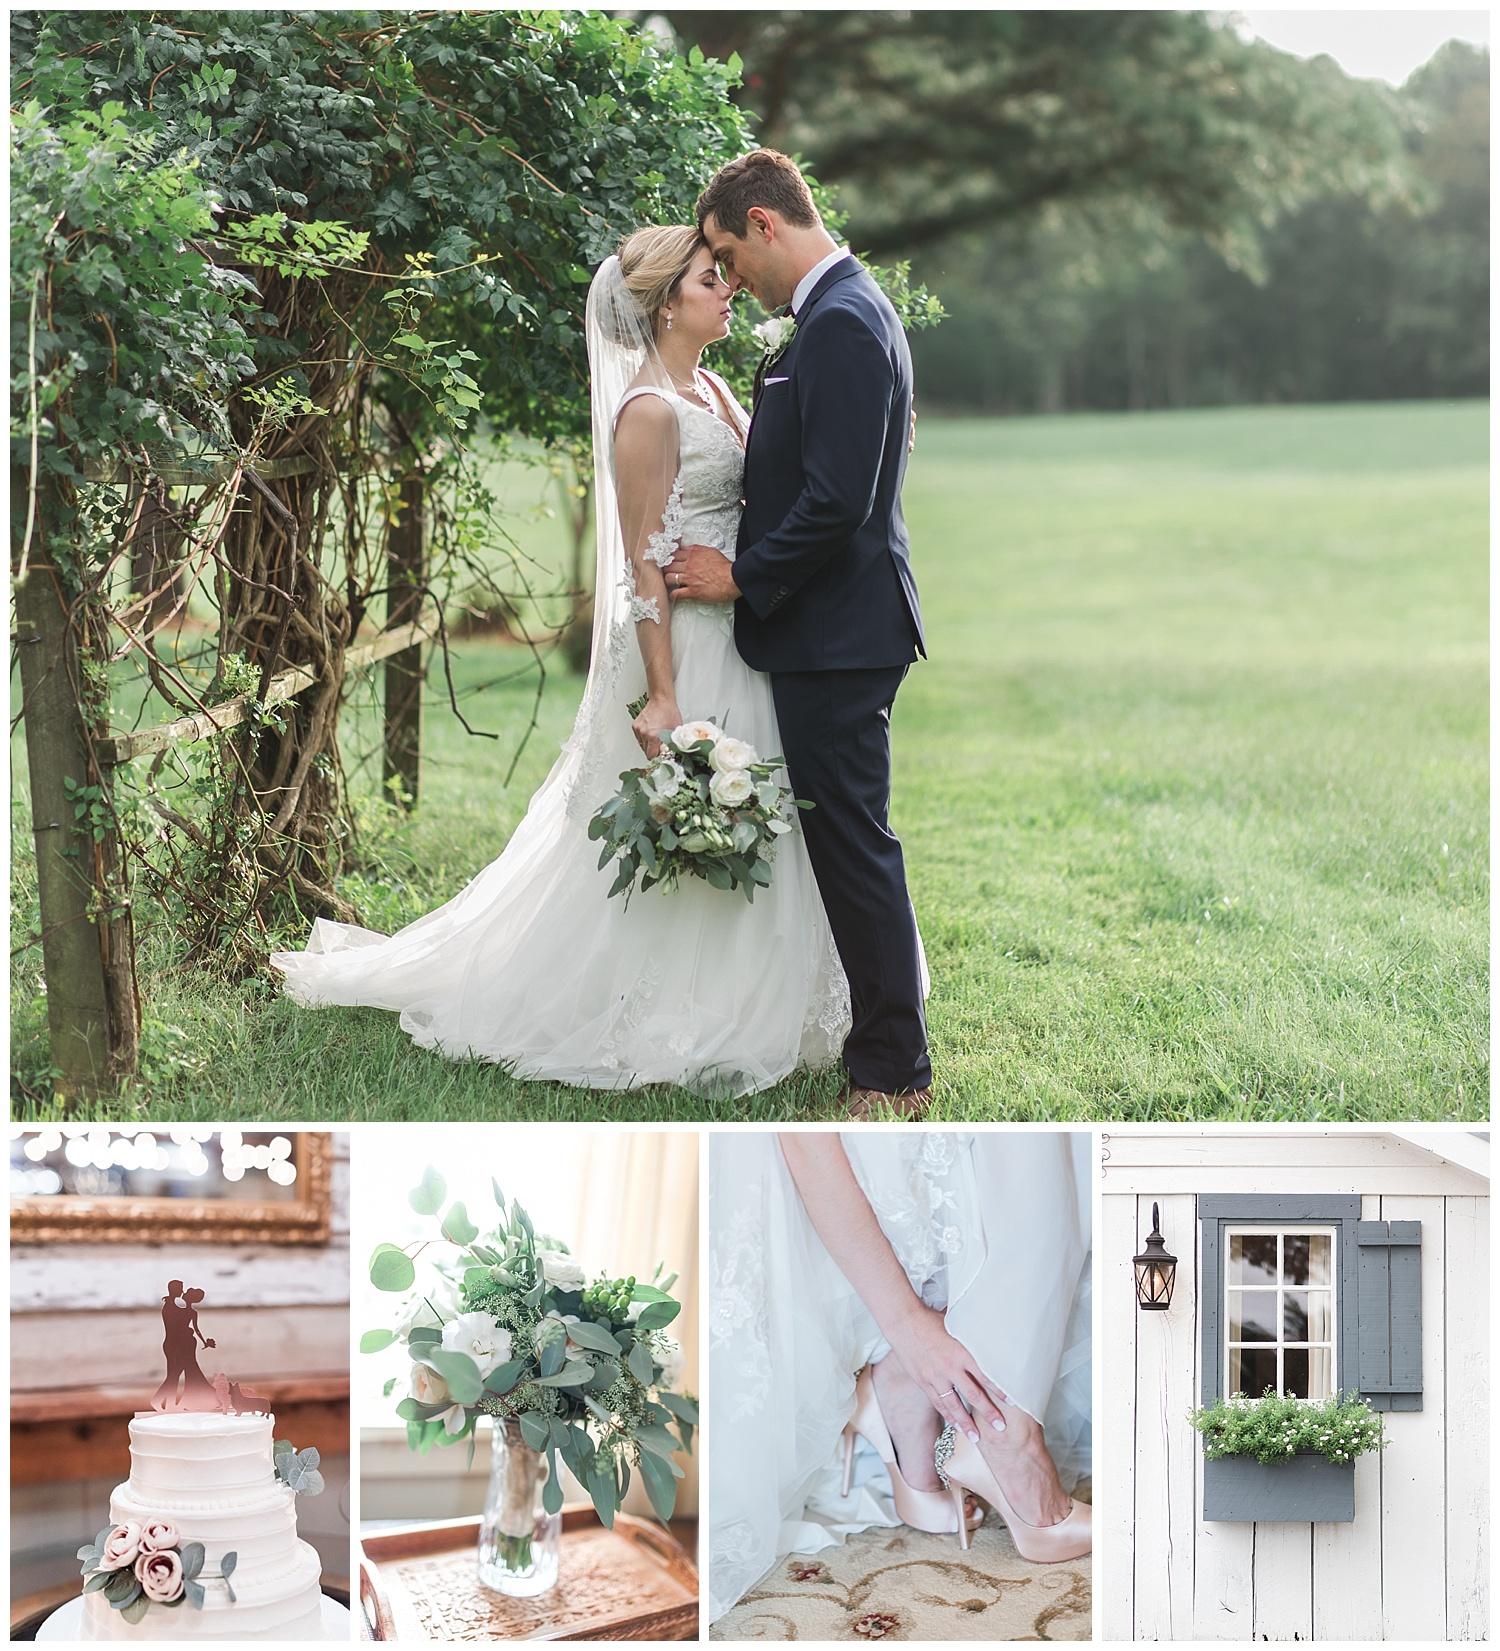 Vineyard Estate at New Kent Winery Wedding photo